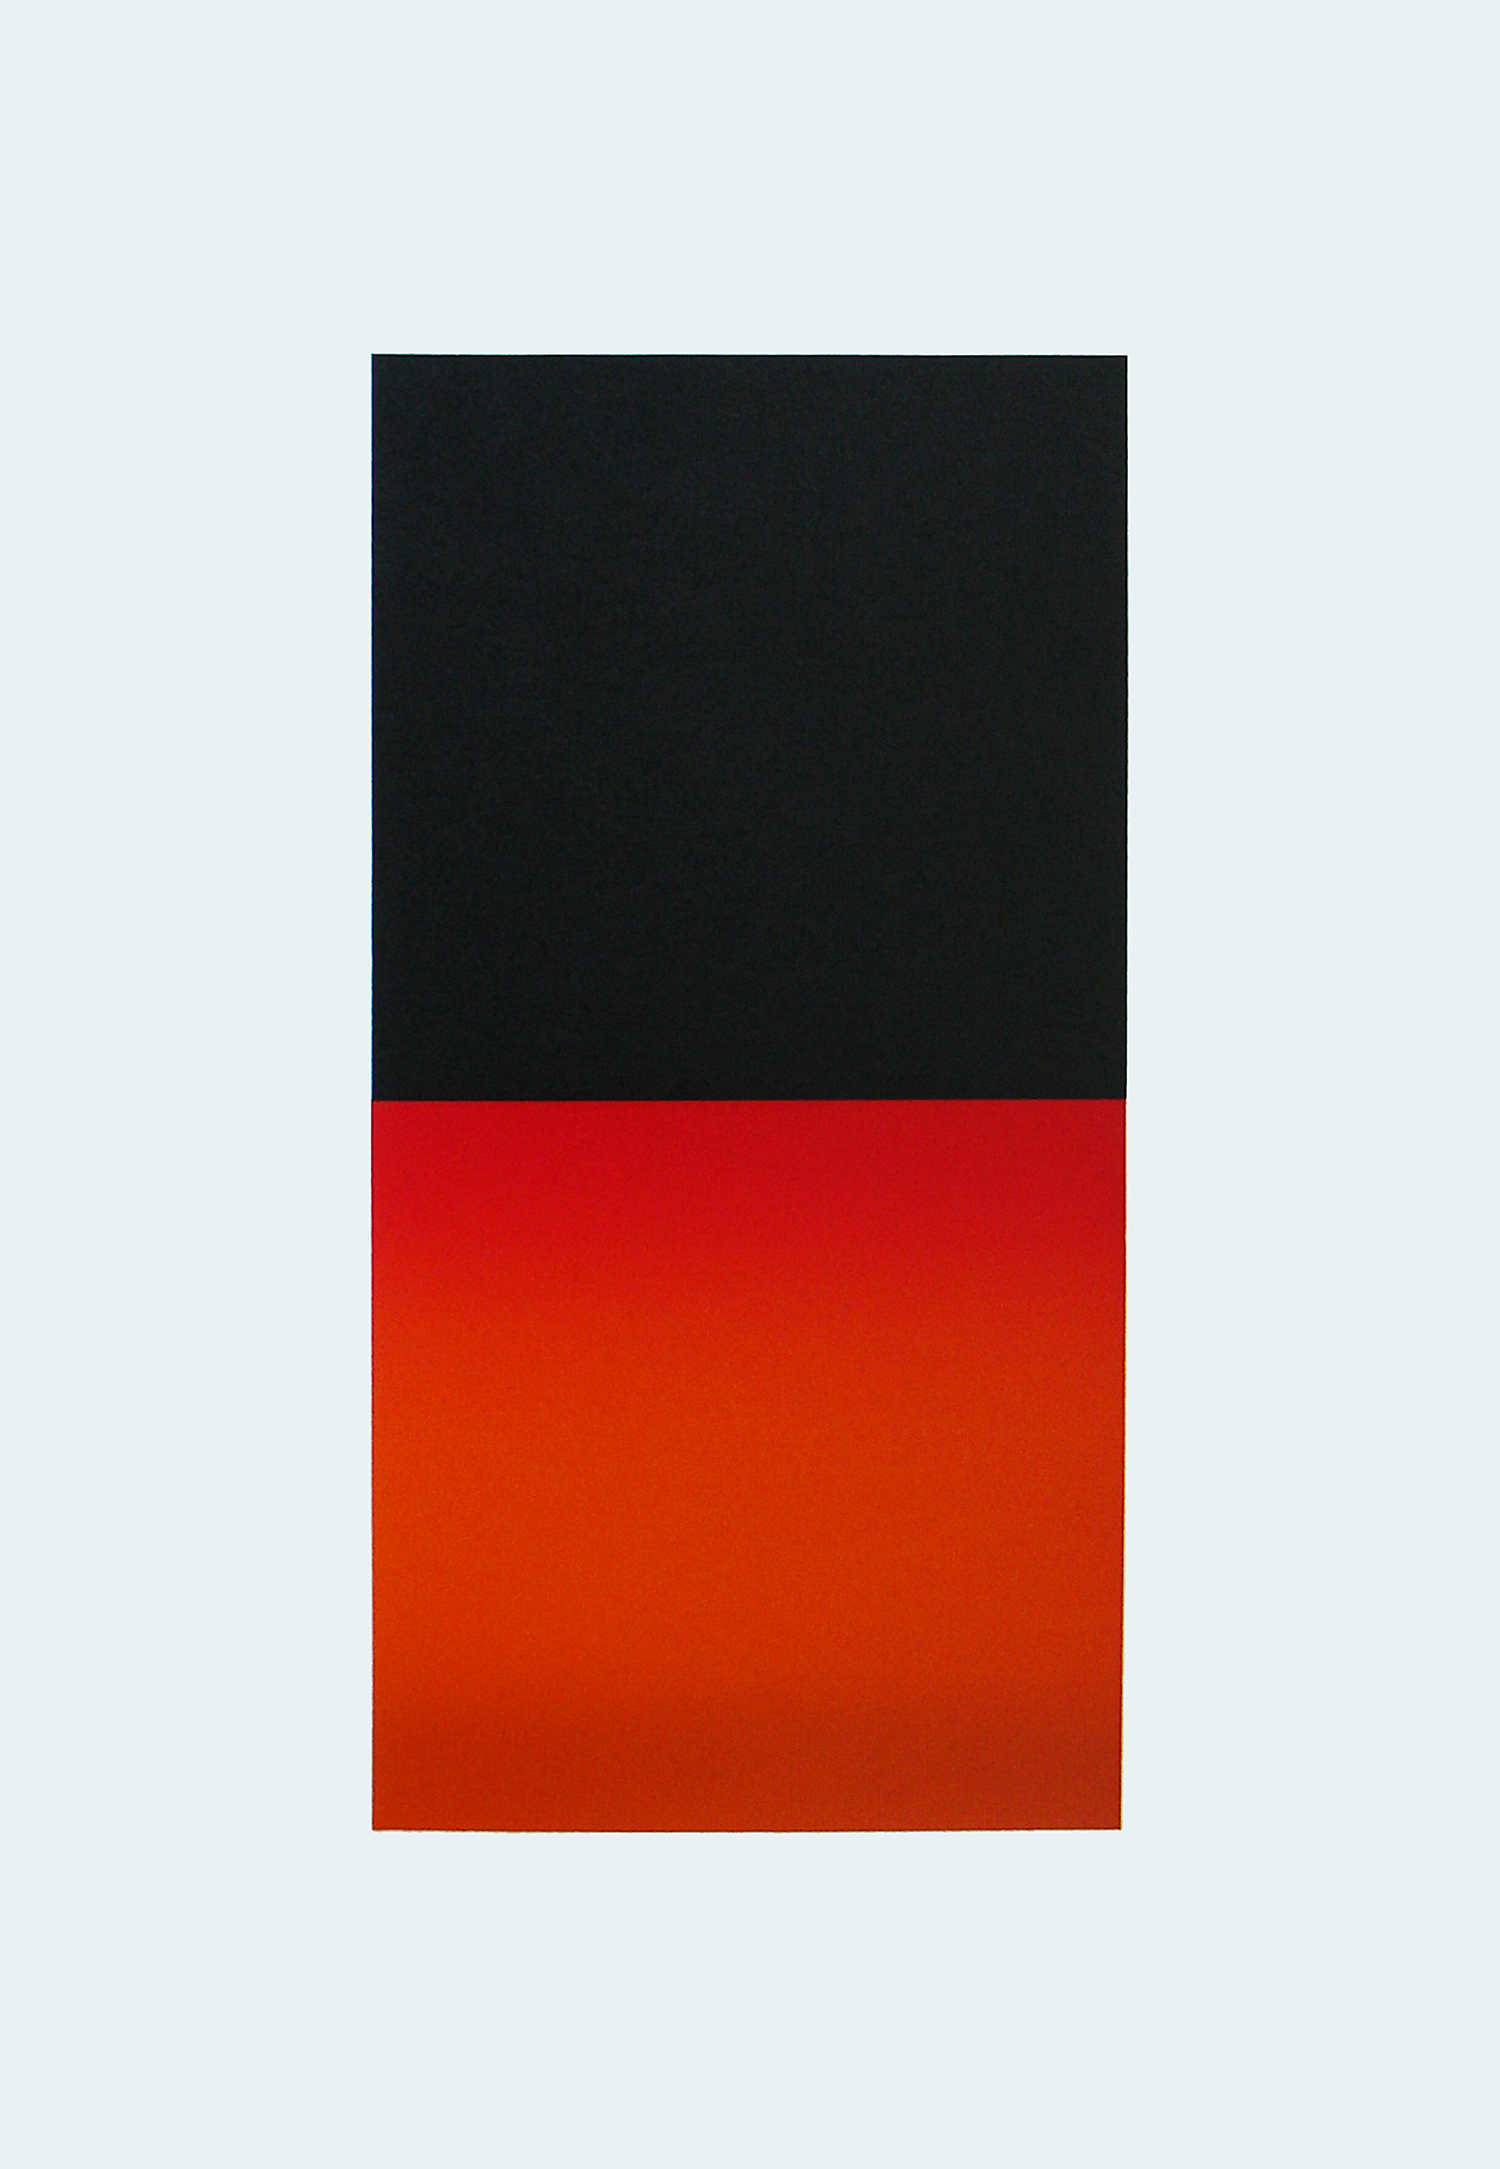 Michael Brick, 10.12.04A    Date:  2004   Size (cm - unframed):  107 x 71.5   Technique:  Screenprint   Materials:  Hannermuller 300gsm   Edition size:  7   Publisher:  The Print Studio   Copyright:  The Artist     P.O.A.